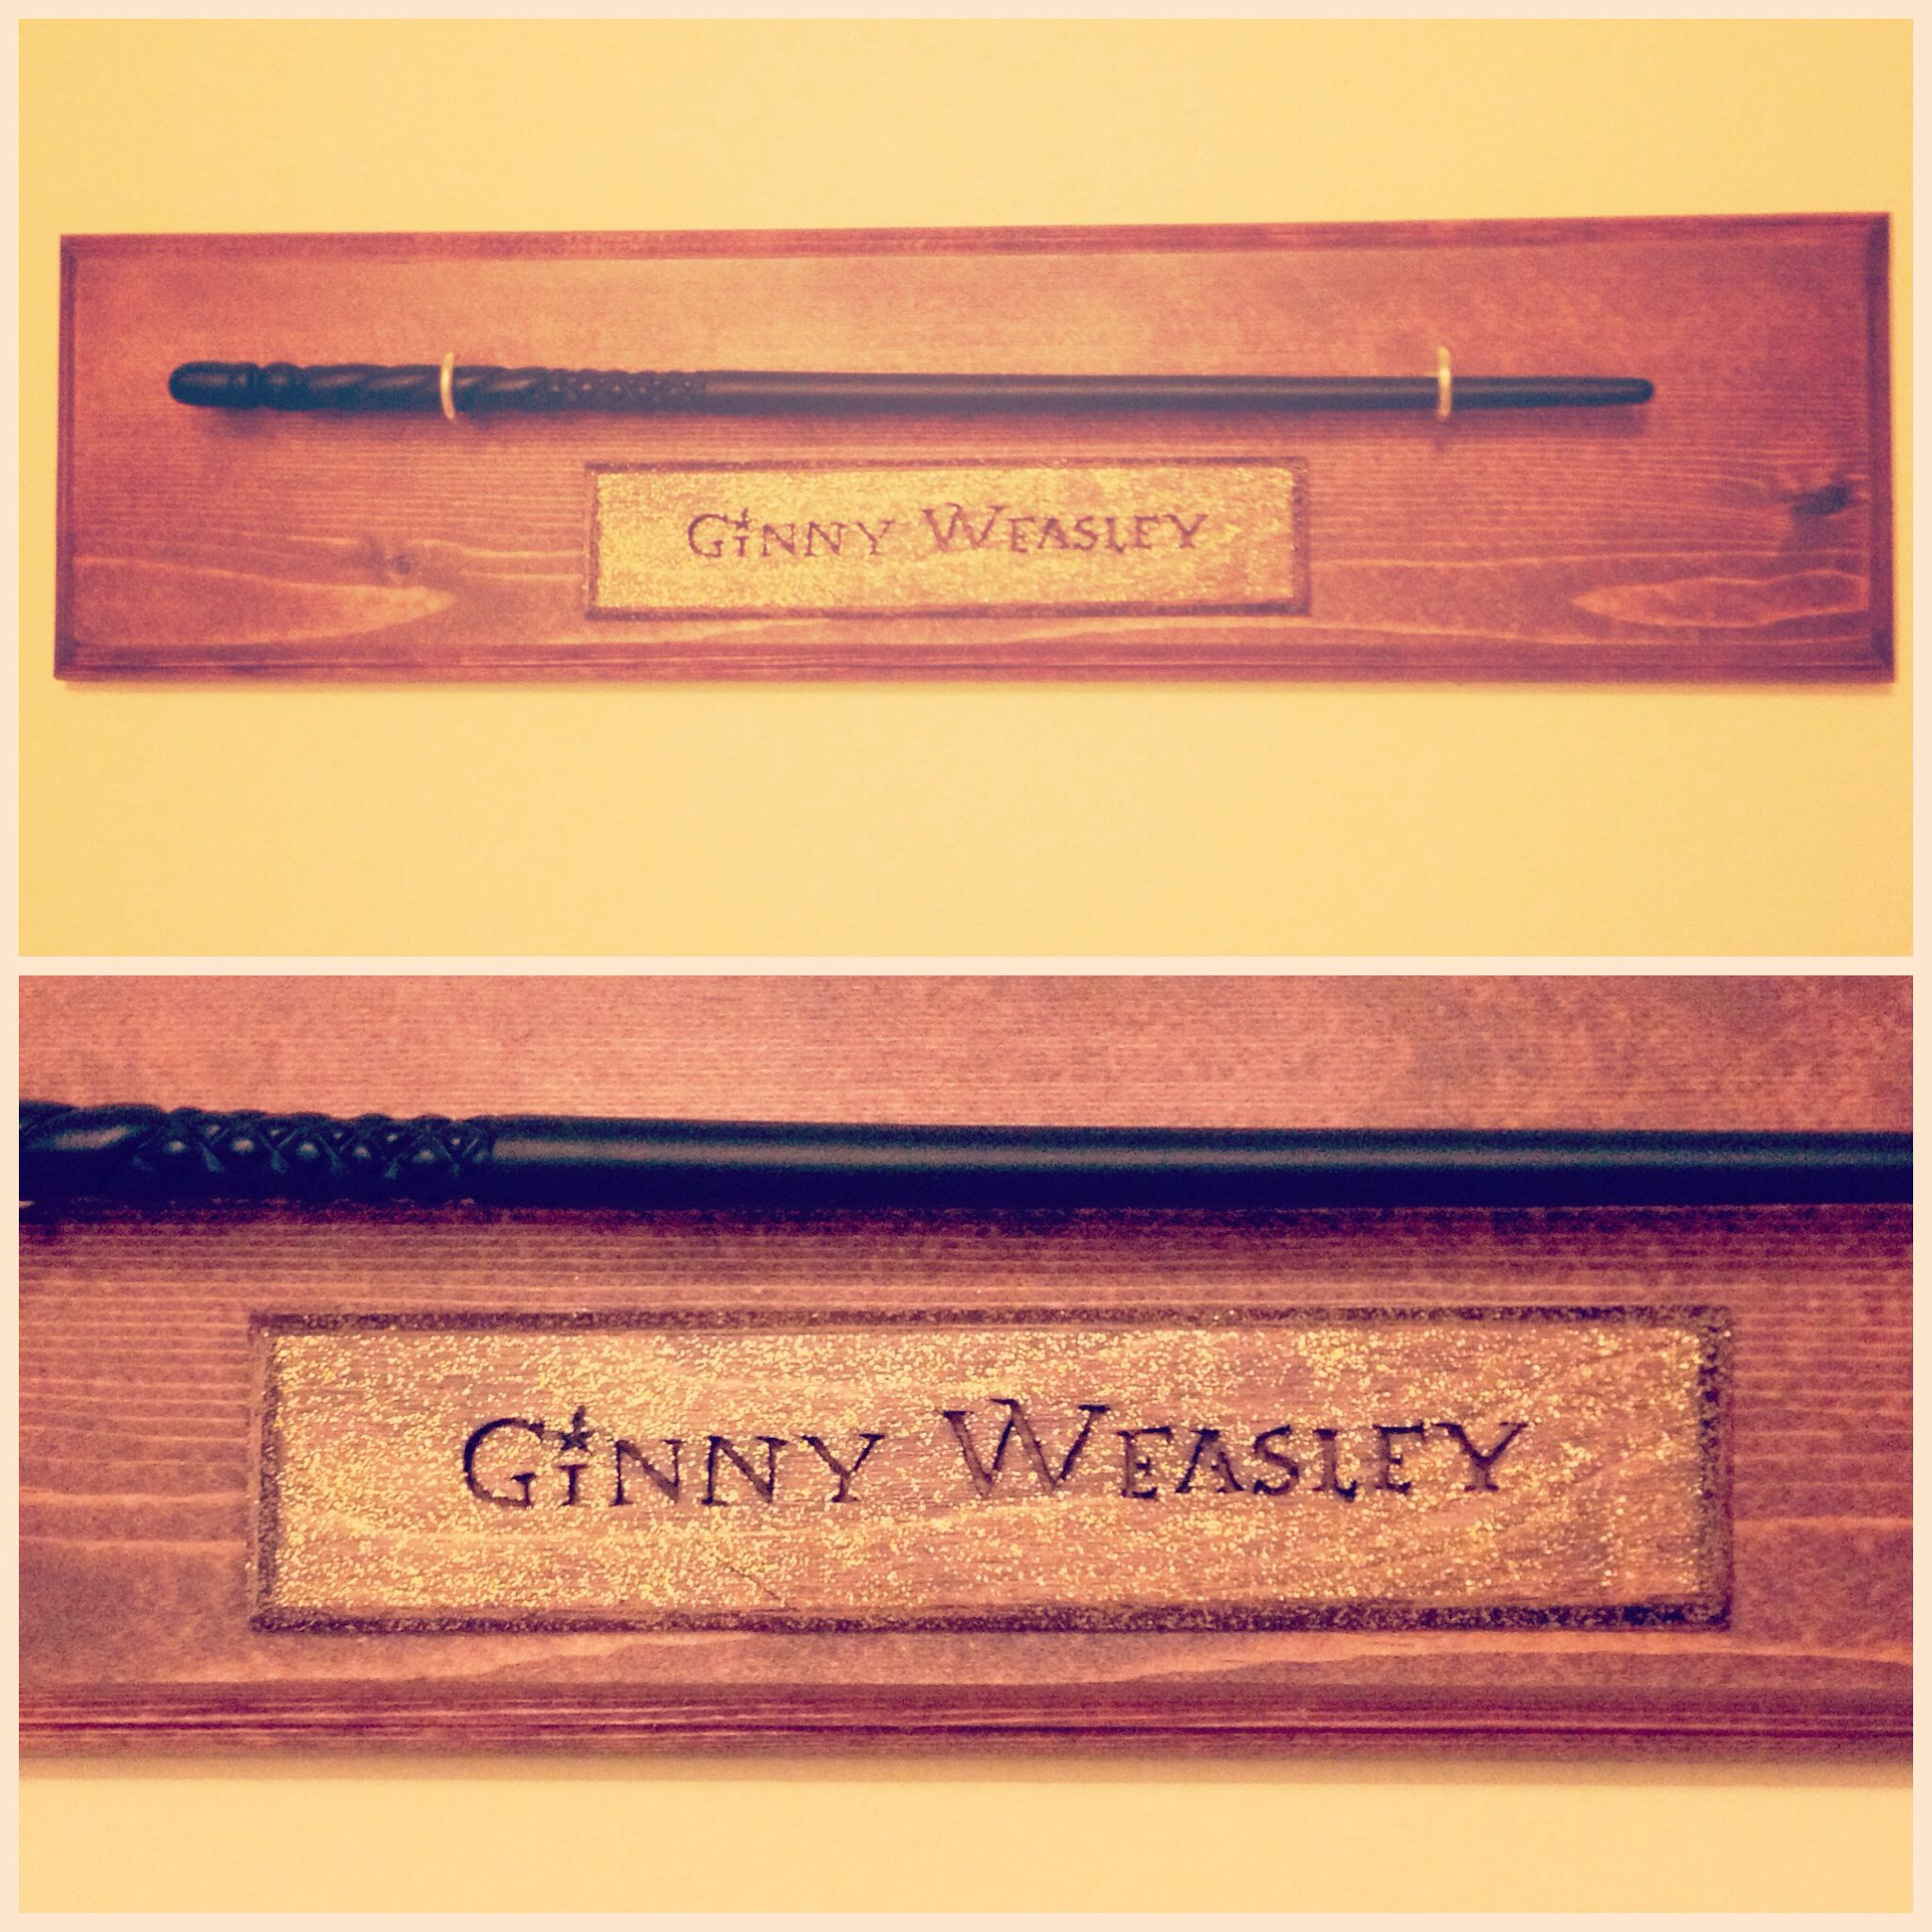 Custom-made display for my Ginny Weasley wand from Wizarding World ...